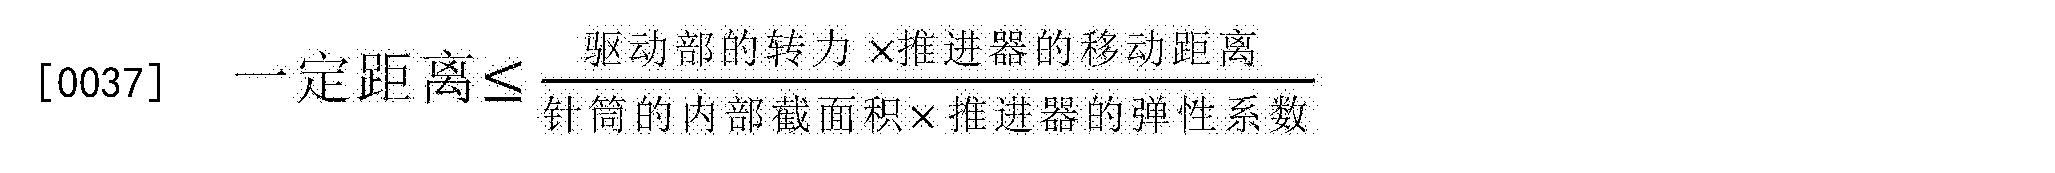 Figure CN105848696AD00052